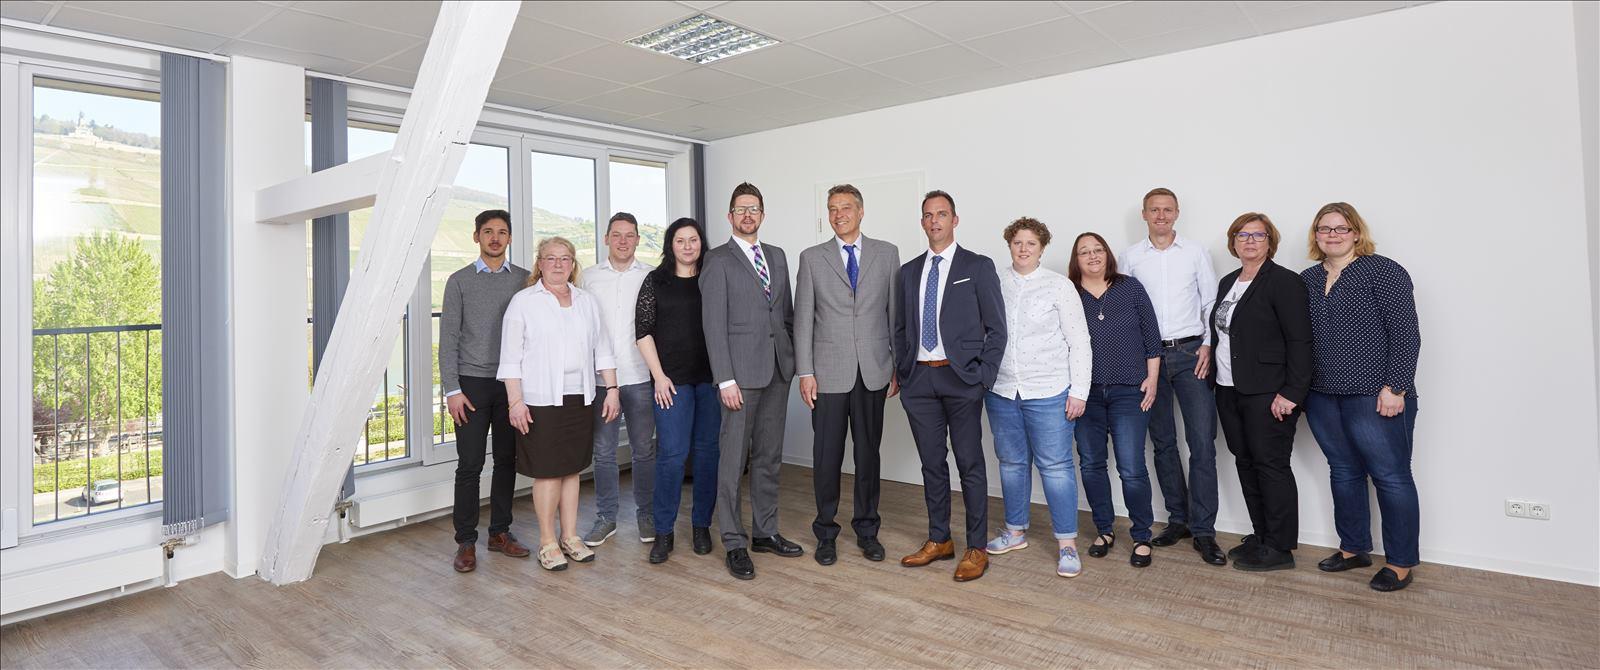 Mießner + Schäfer GmbH Steuerberatungs- u. Wirtschaftsberatungsgesellschaft